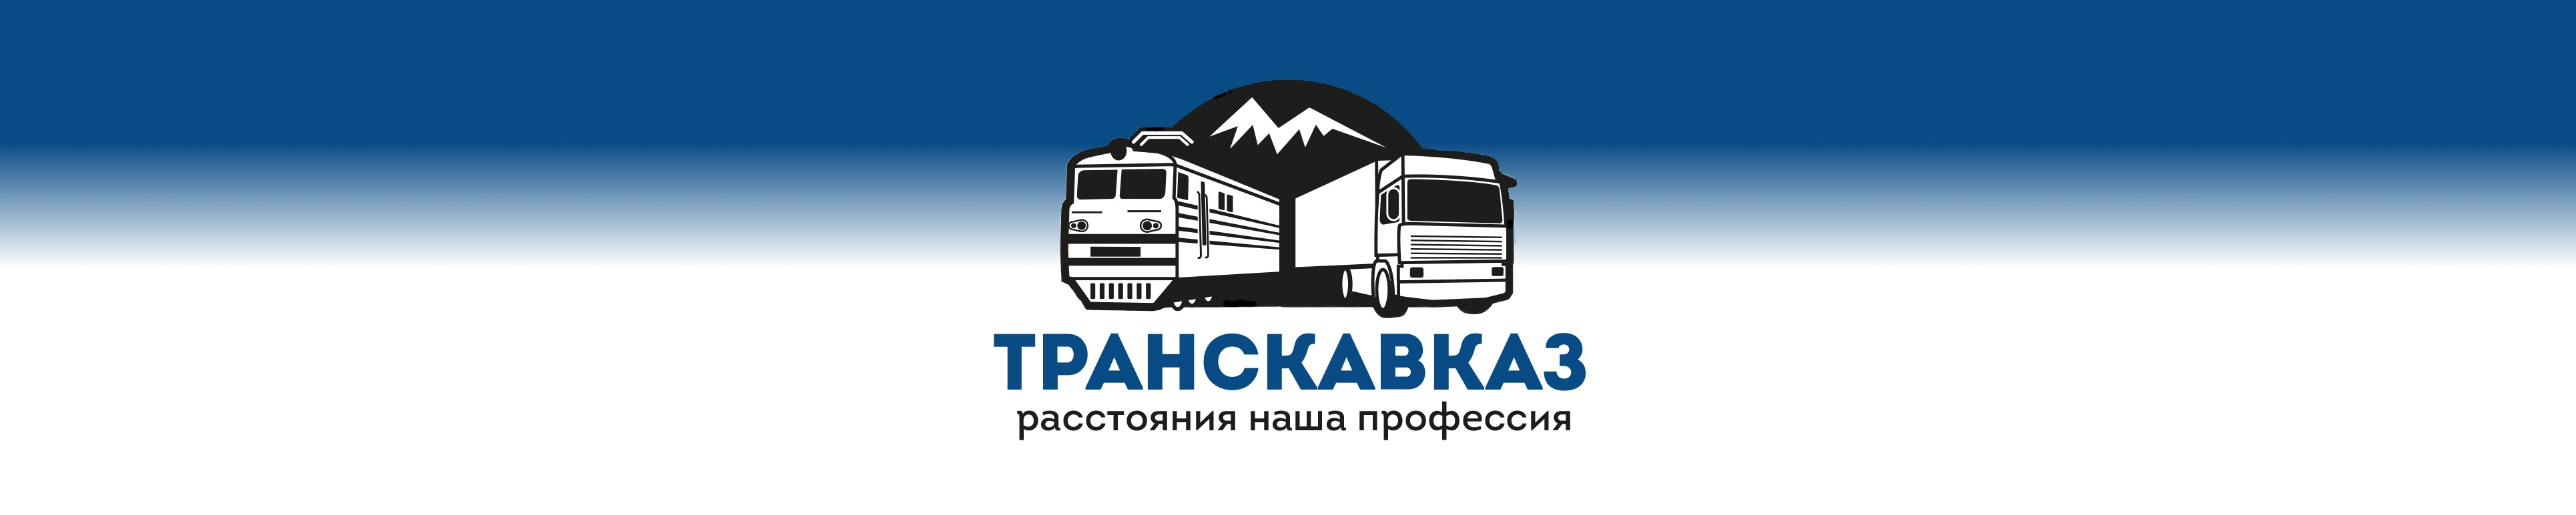 Группа компаний Юг Транс КМВ, Транс Кавказ